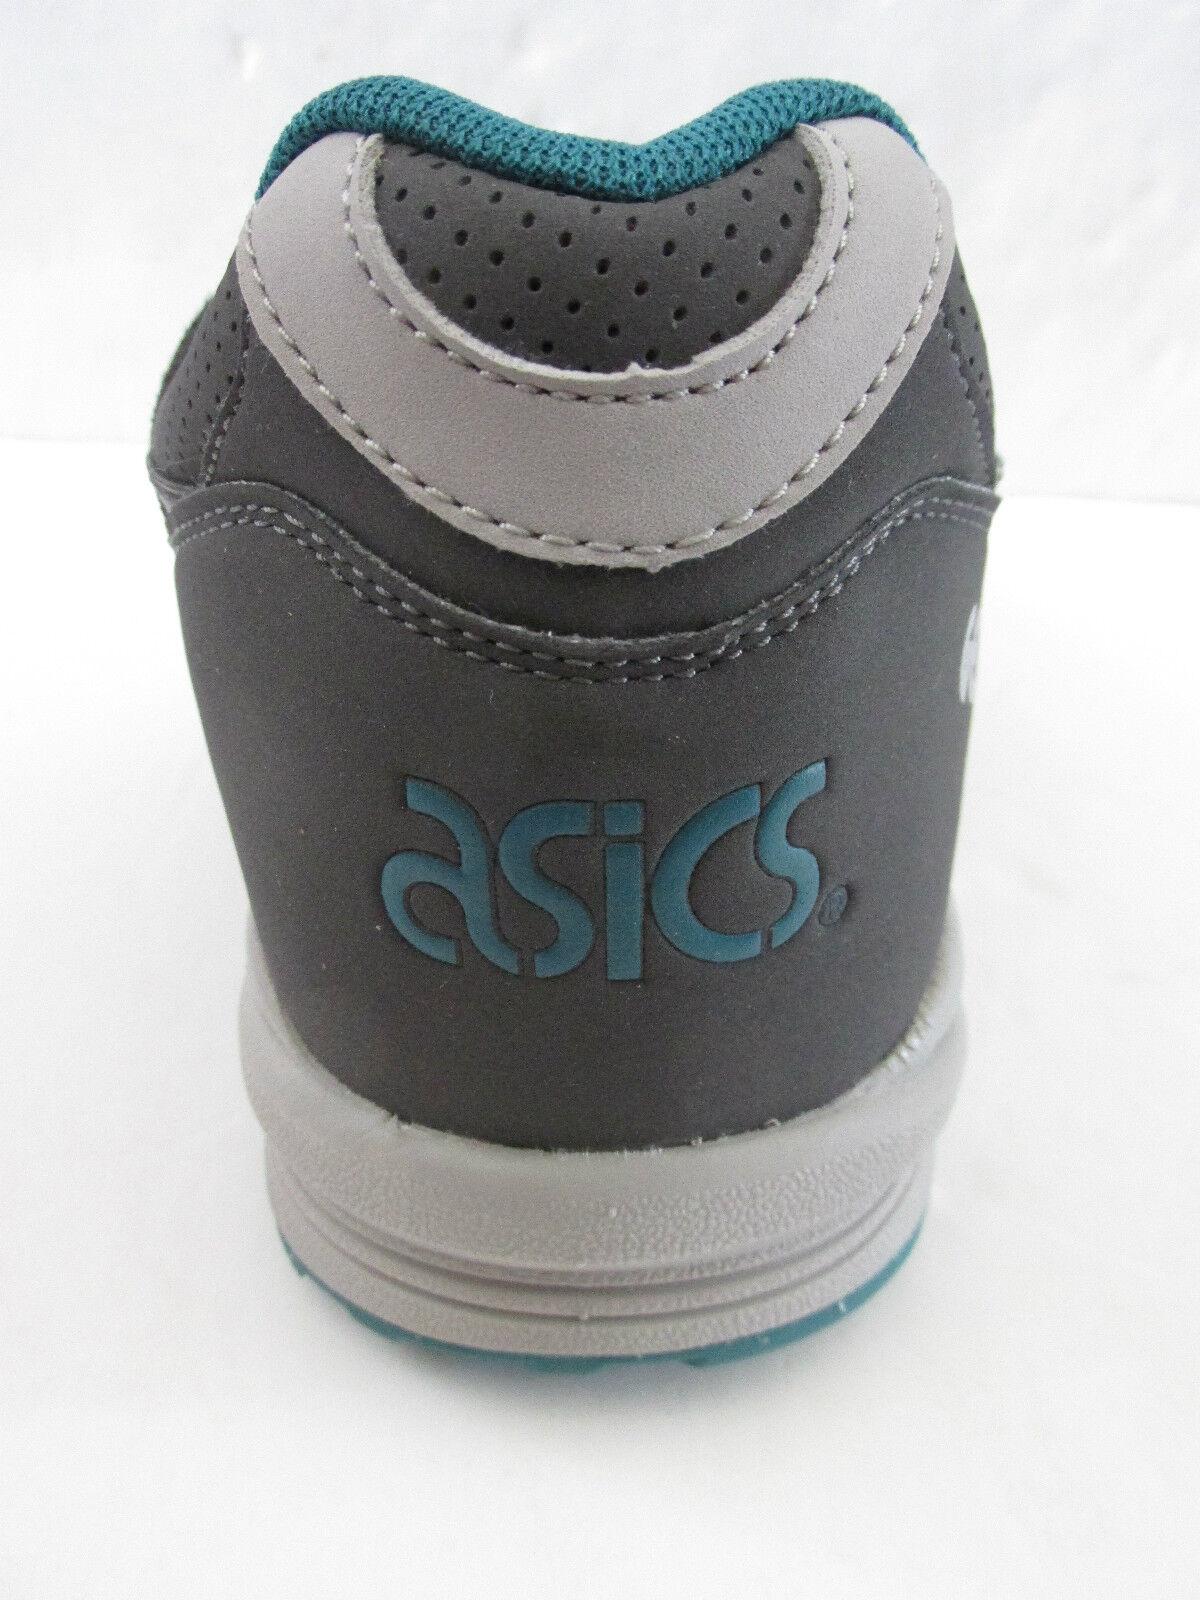 Asics Asics Asics Gel Saga Herren Turnschuhe H4A3Y 1616 Turnschuhe 67433e